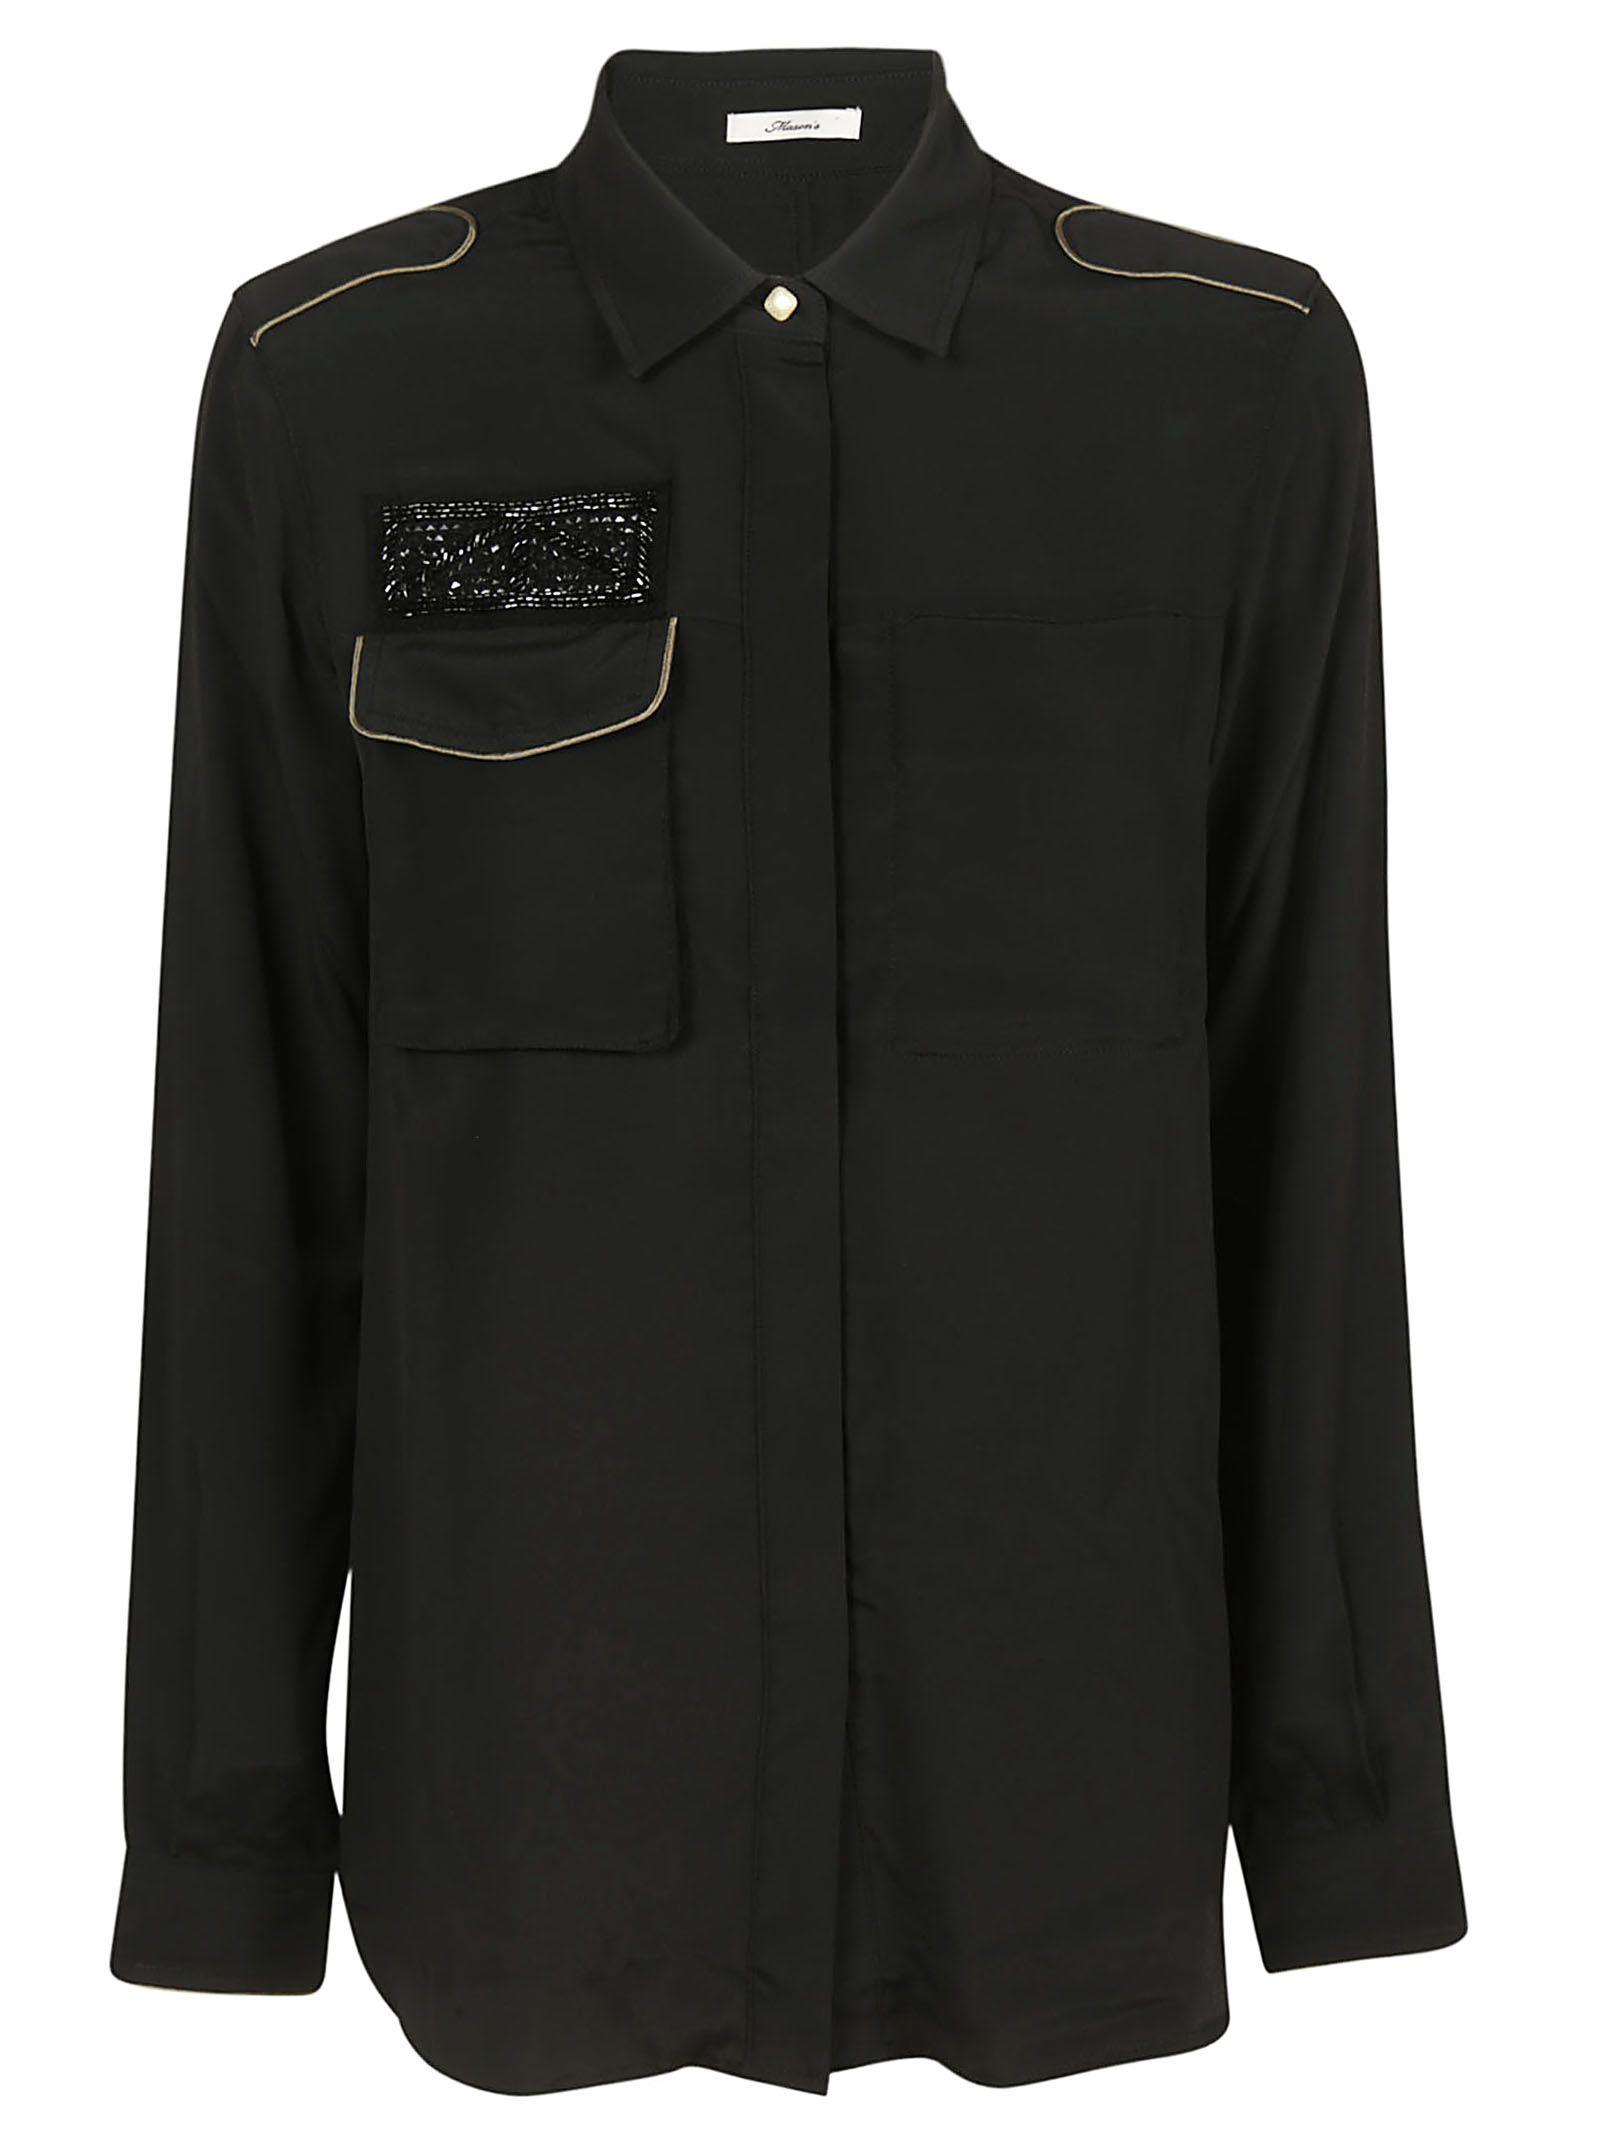 MASON'S Safari Shirt in Nero